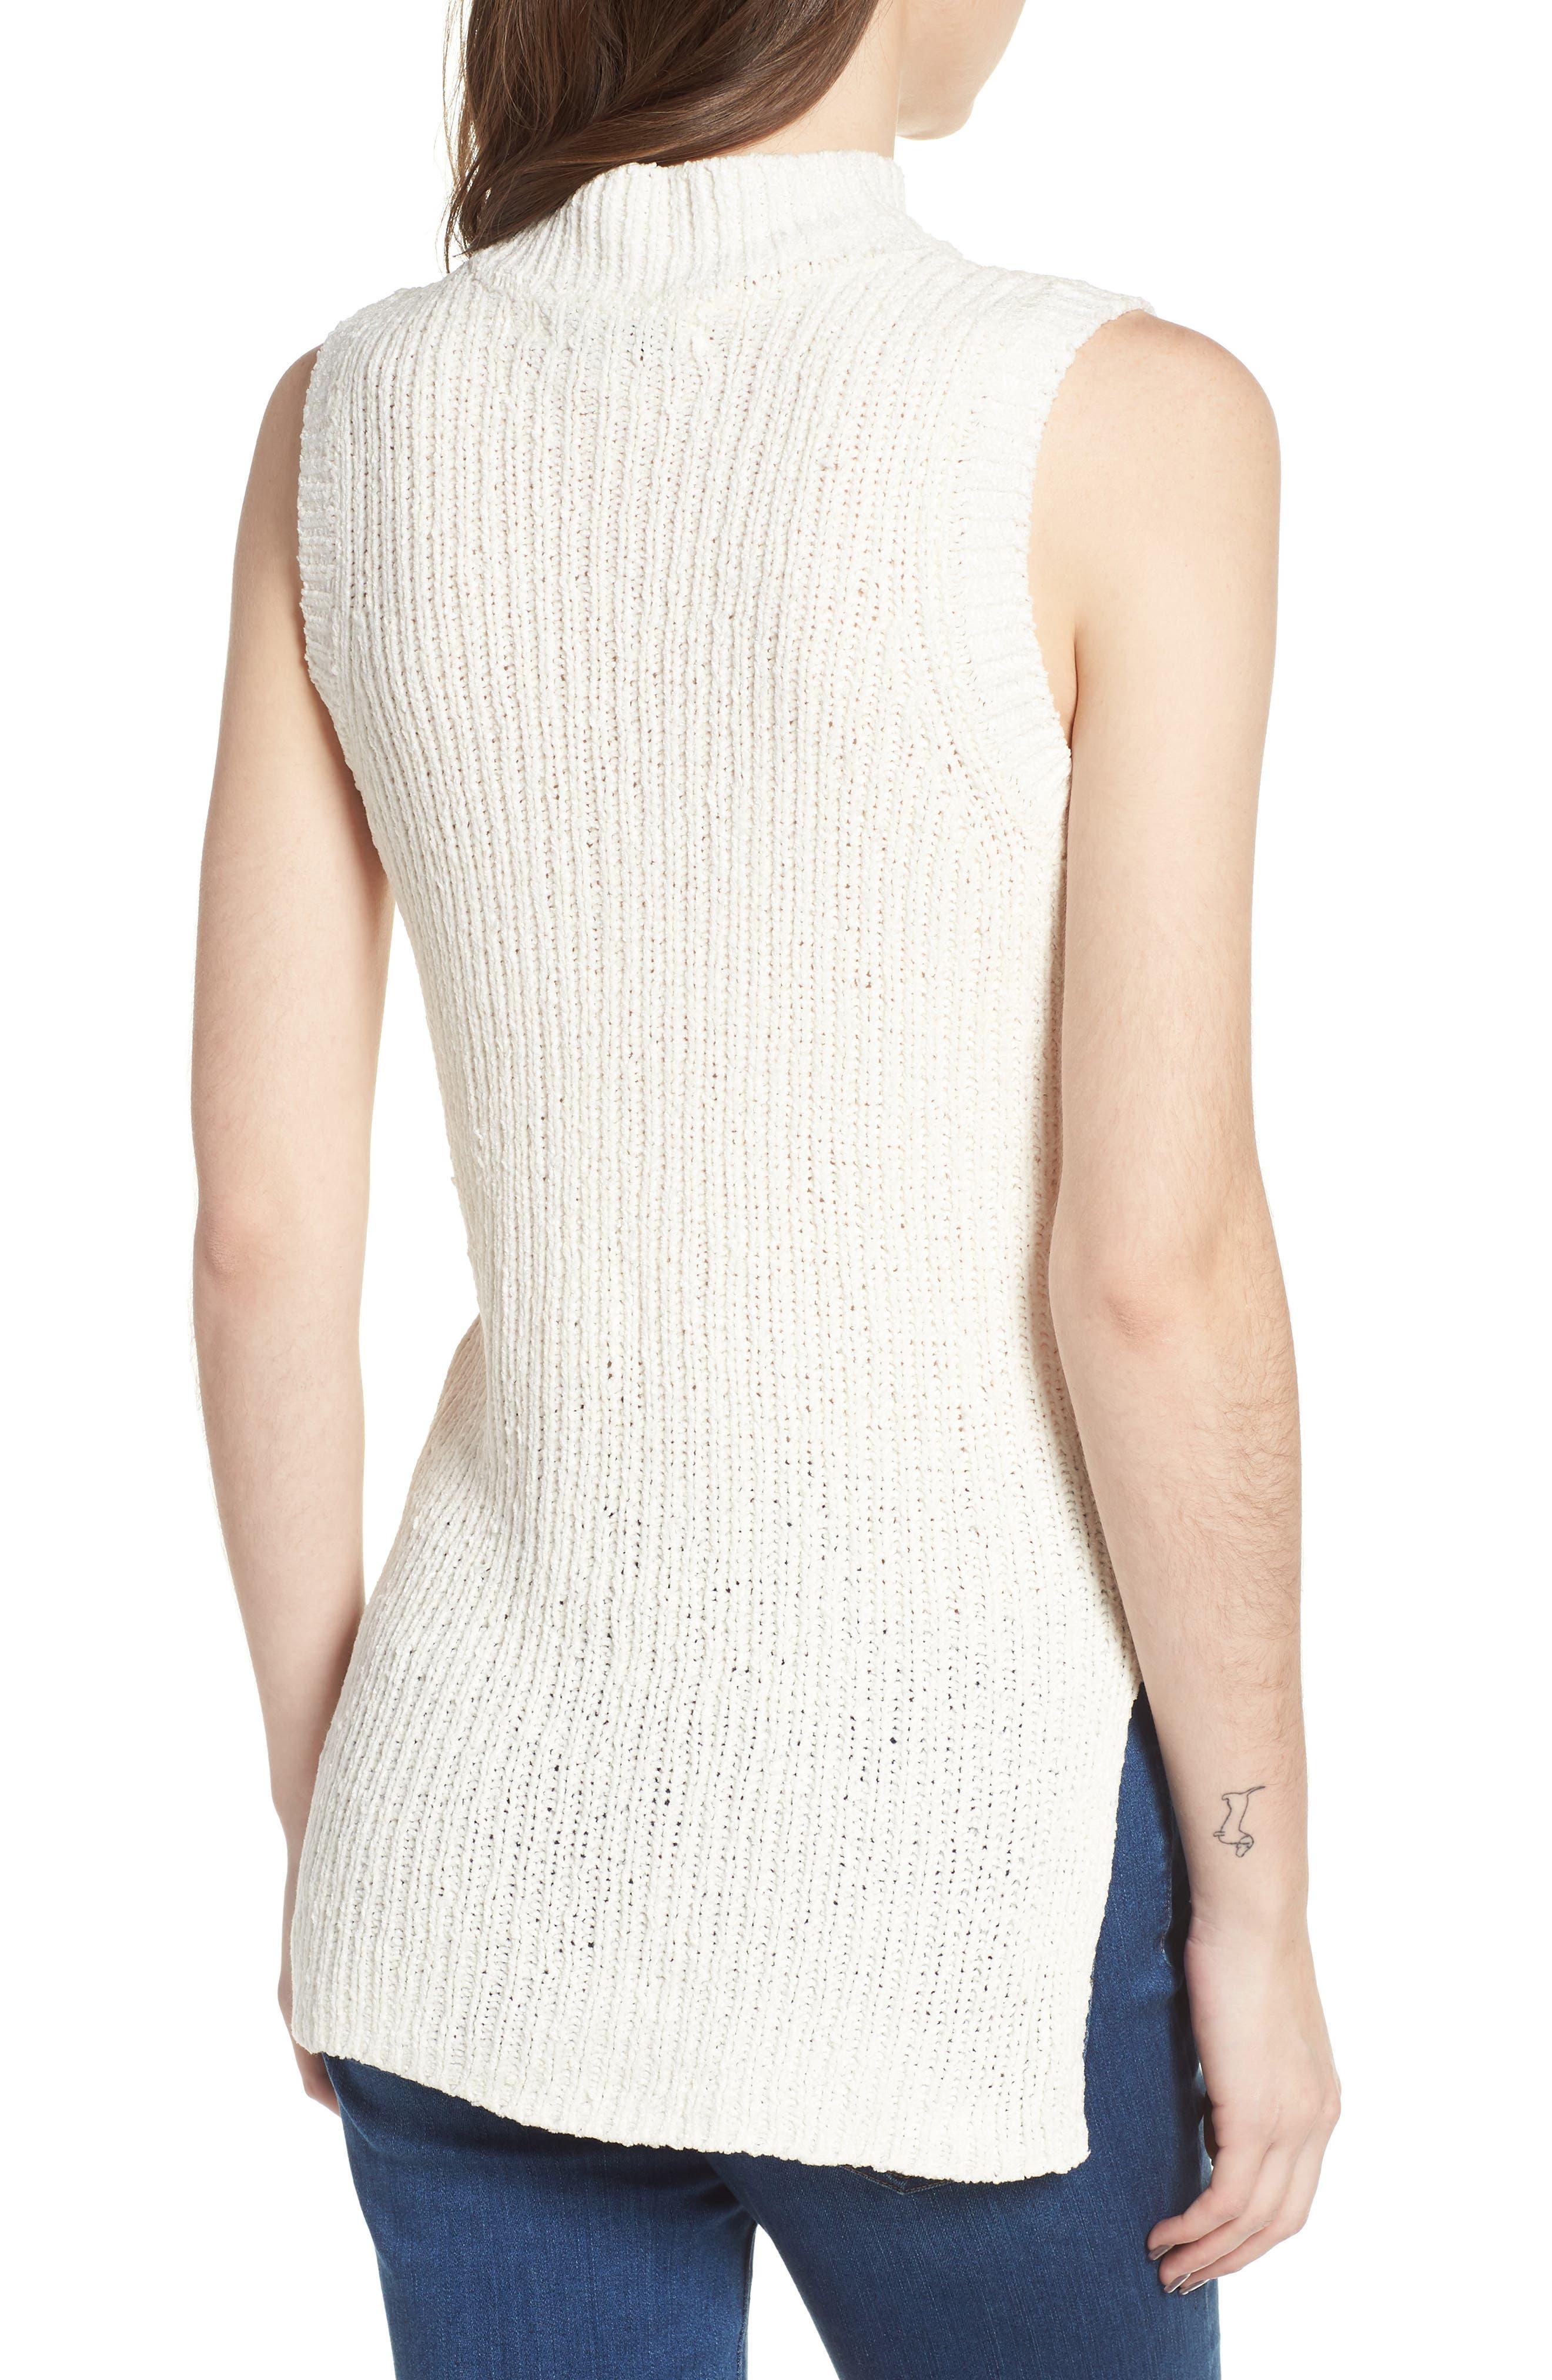 Camdon Sleeveless Sweater,                             Alternate thumbnail 2, color,                             900